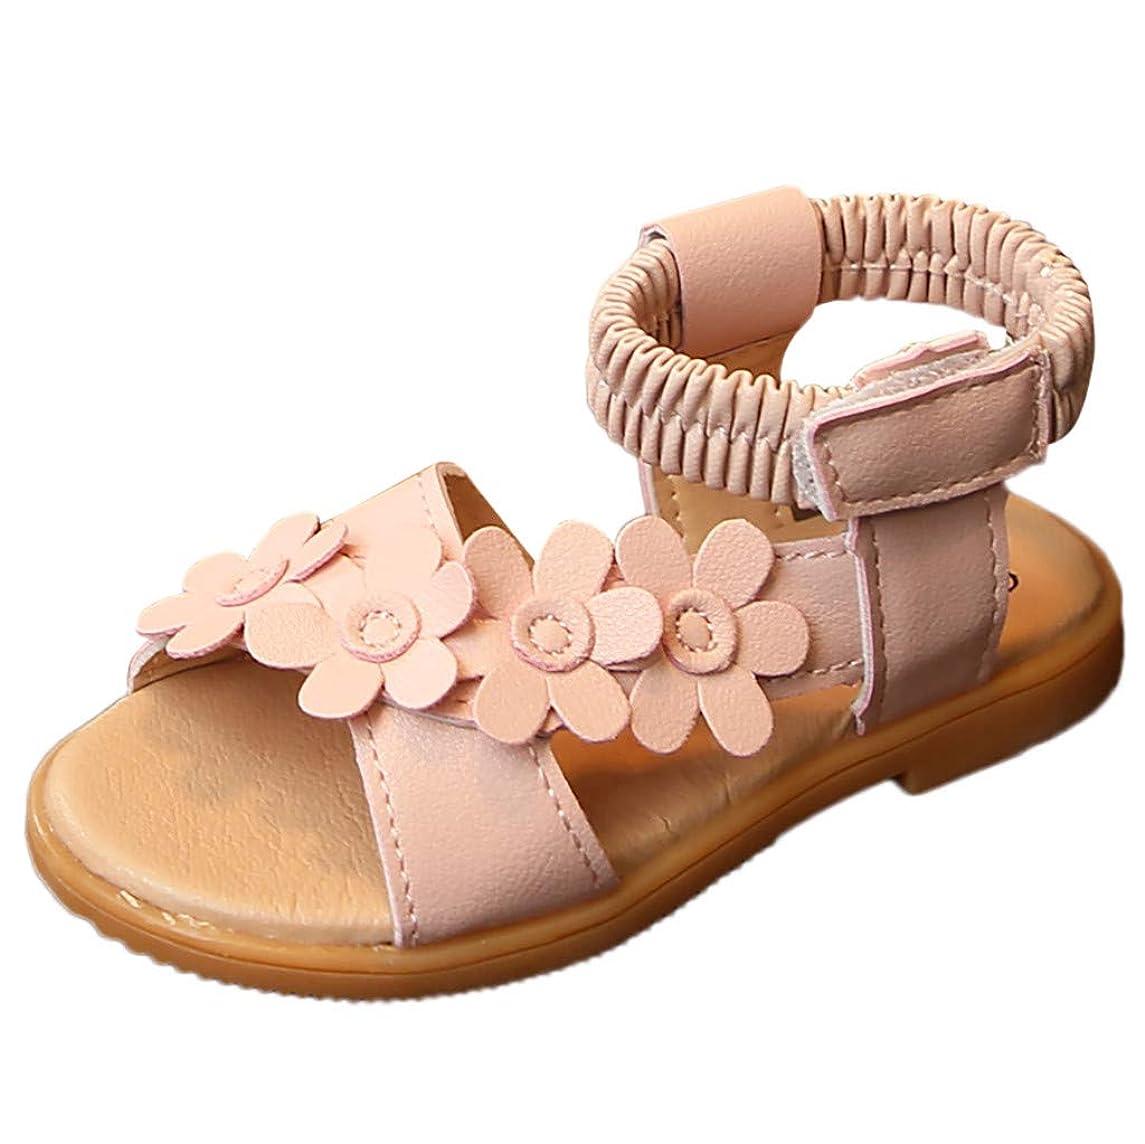 MALLOOM Toddler Infant Kids Baby Little Girls Flower Princess Beach Shoes Roman Sandals